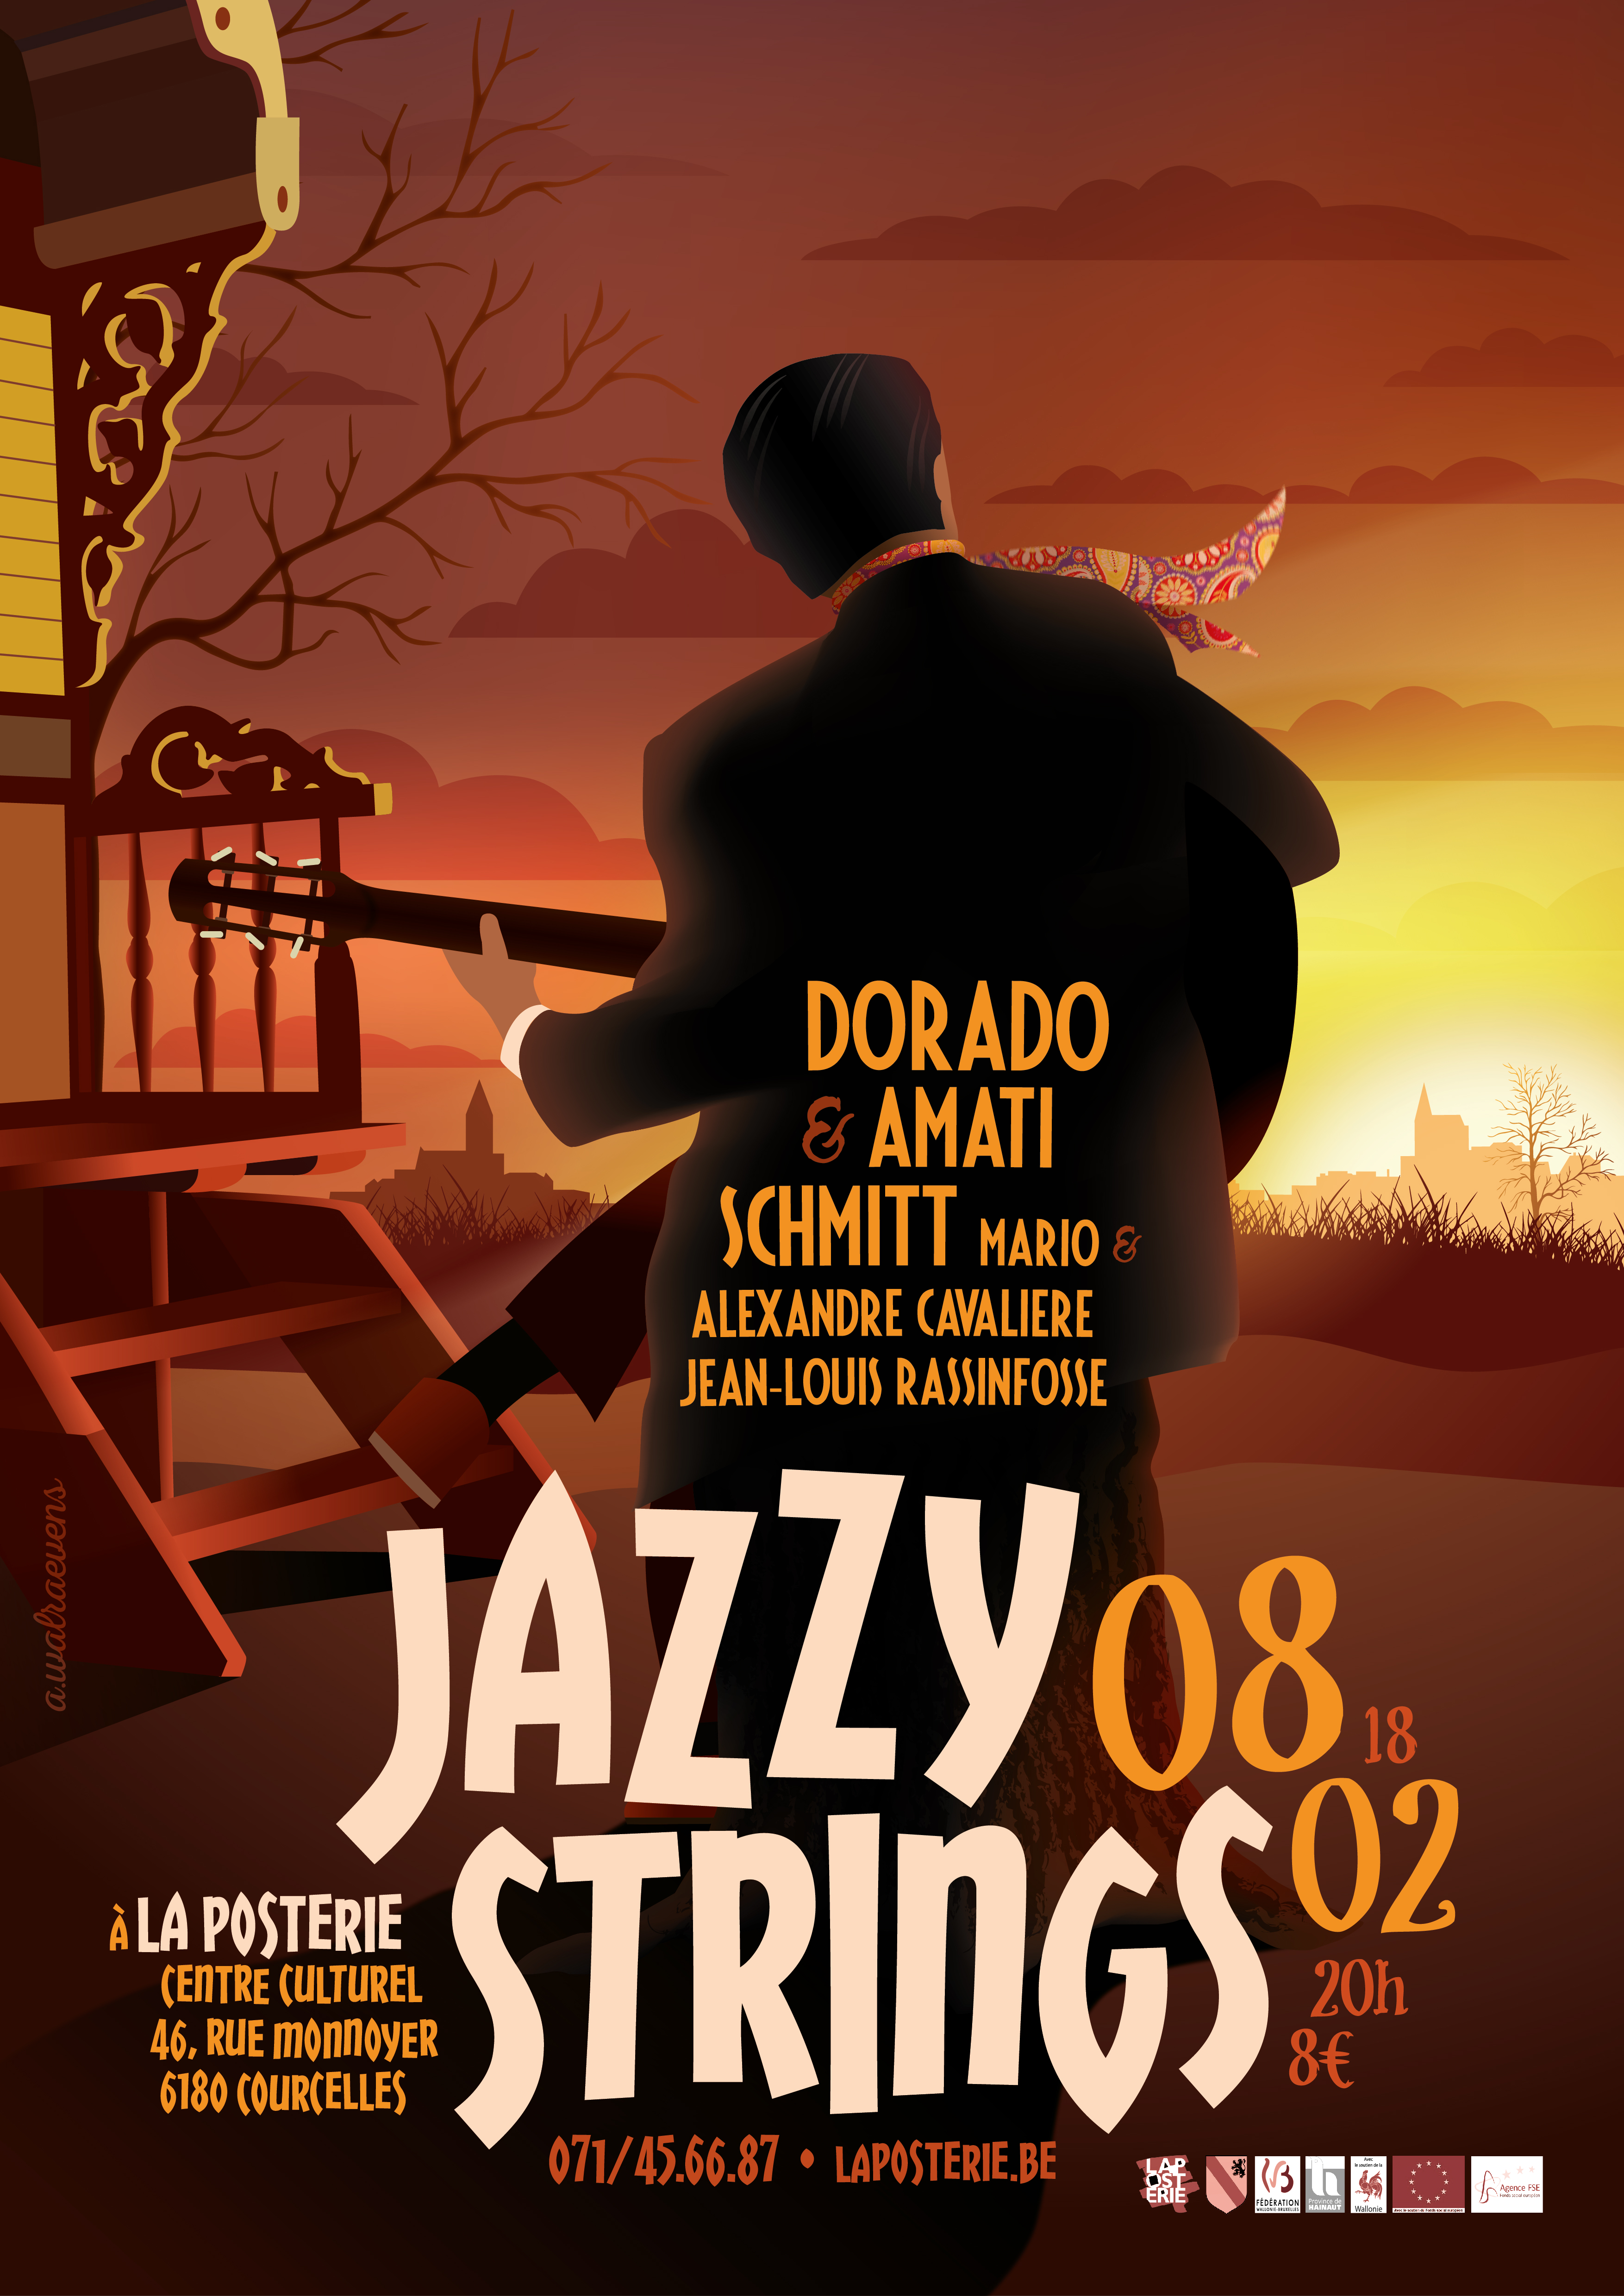 Jazzy Strings Dorado Amati Schmitt